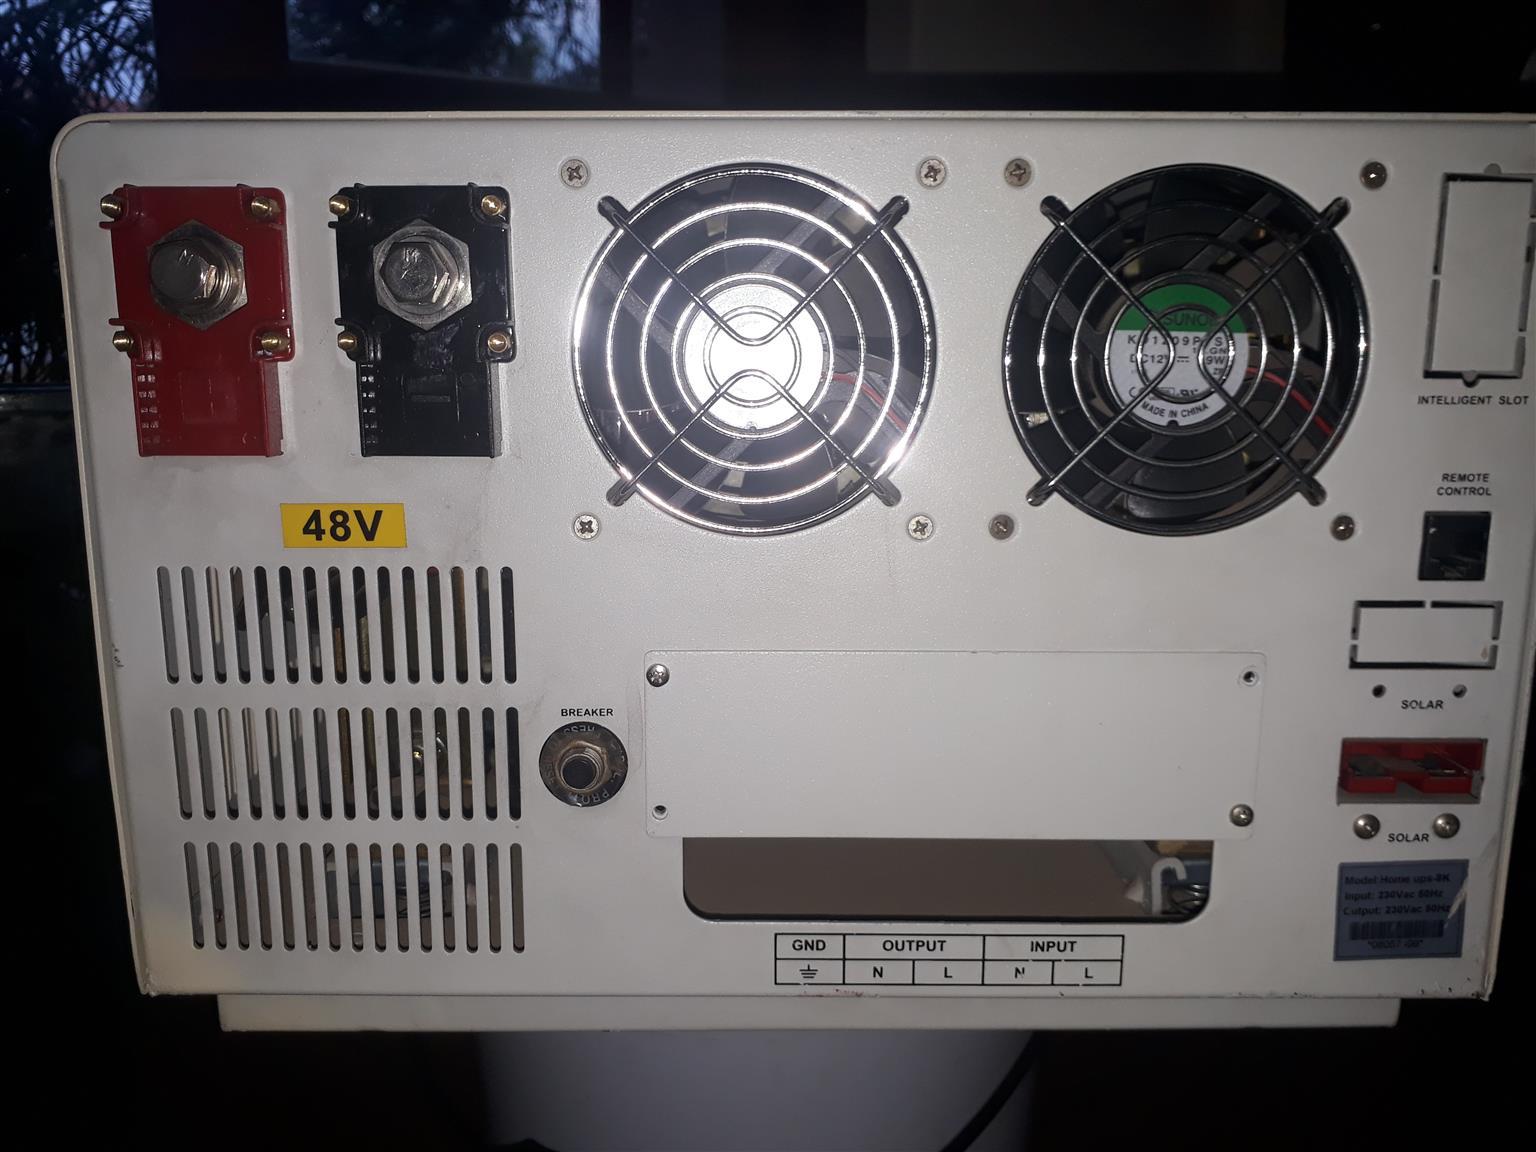 8000 w ups inverter